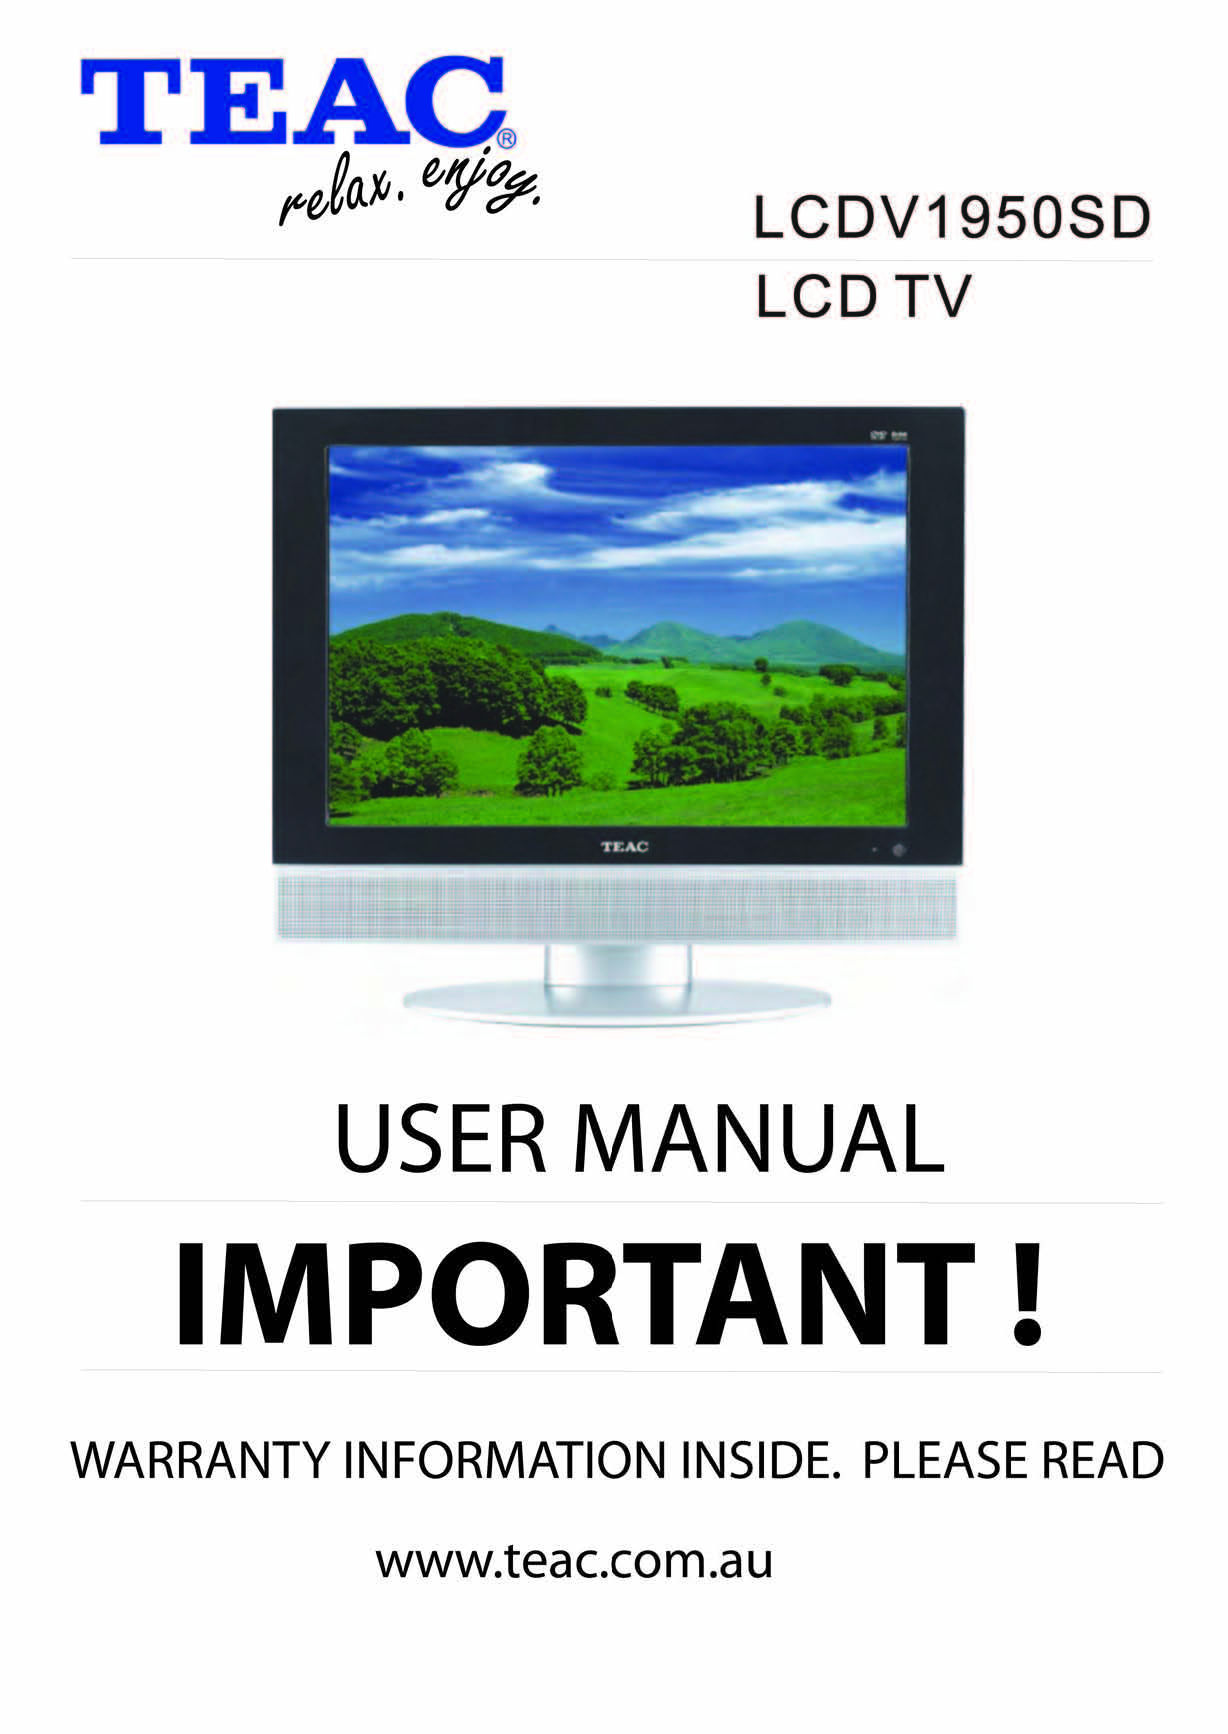 teac lcdv1950sd instruction manual store809 rh store809 com TEAC Receiver Manual TEAC CD Recorder Manual